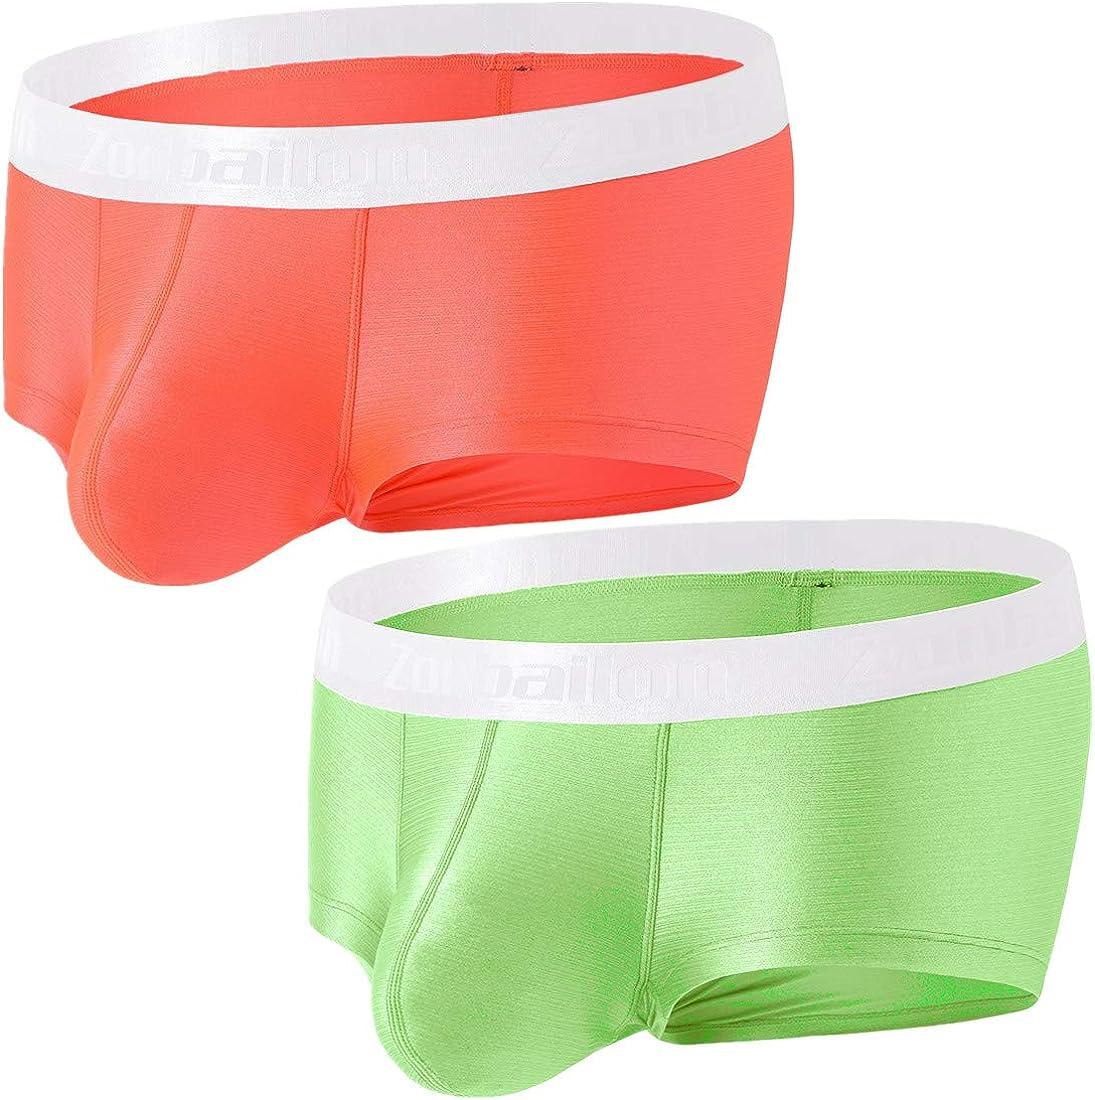 Zonbailon Sexy Mens Bulge Enhancing Underwear Ice Silk Big Pouch Briefs Short Leg Trunks M L XL XXL 3XL